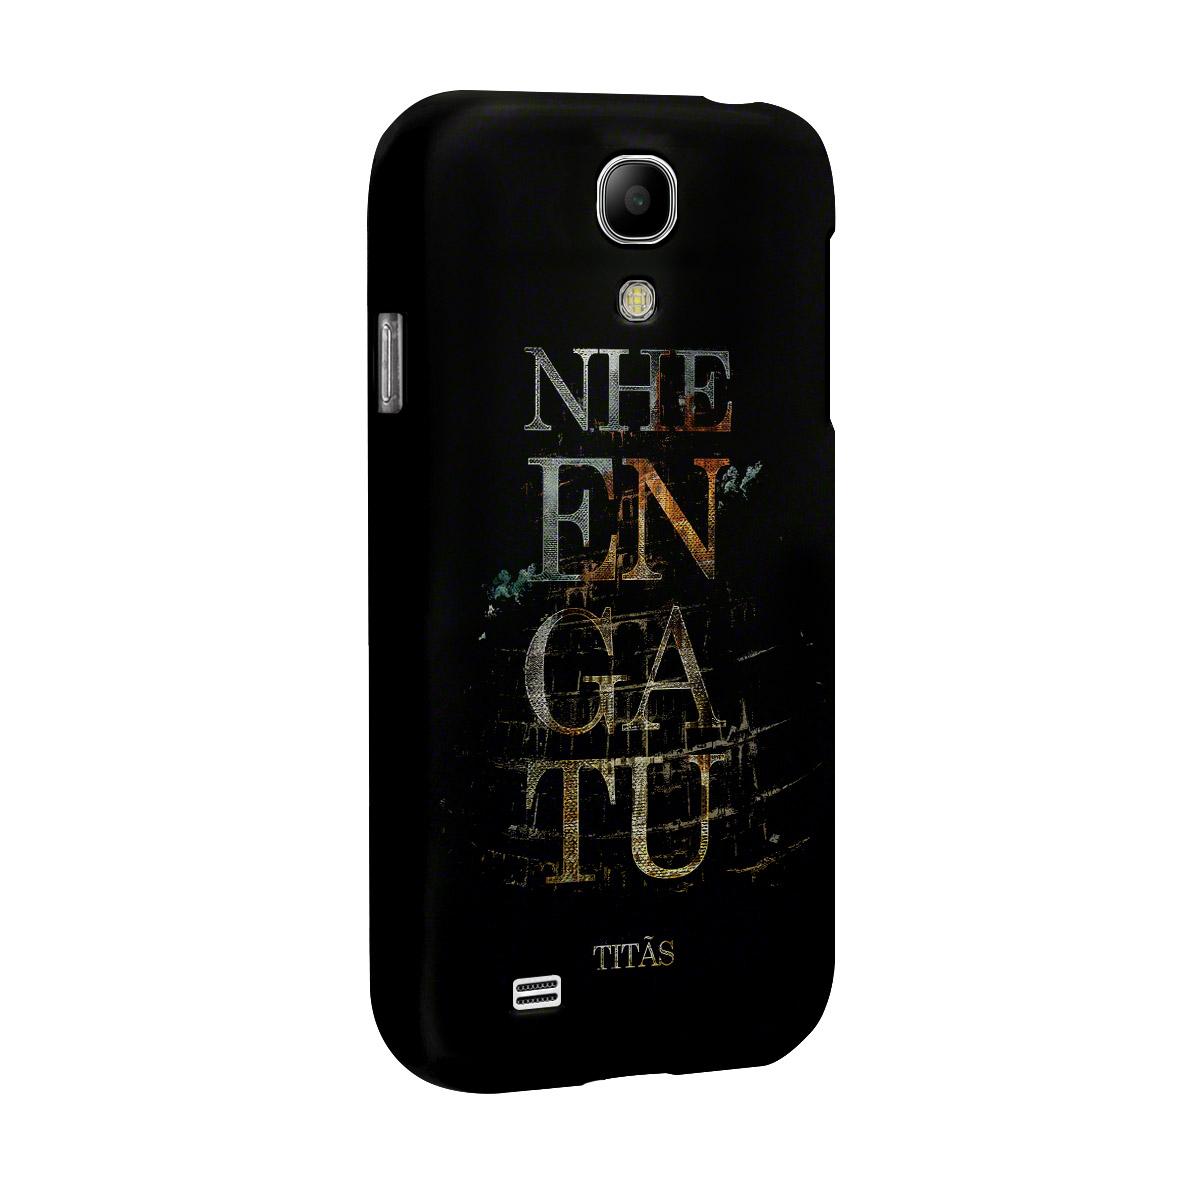 Capa de Celular Samsung Galaxy S4 Titãs Nheengatu